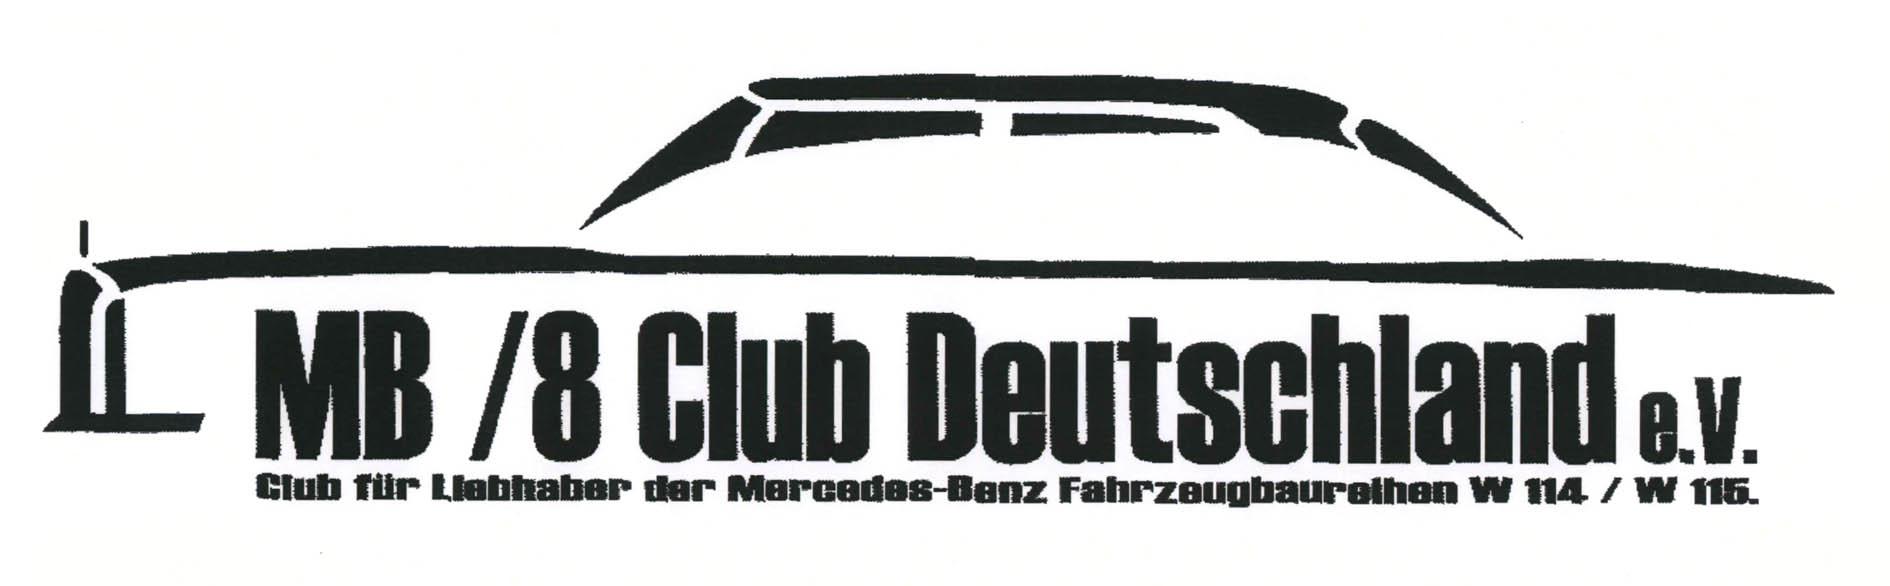 MB/8 Club Deutschland e.V.